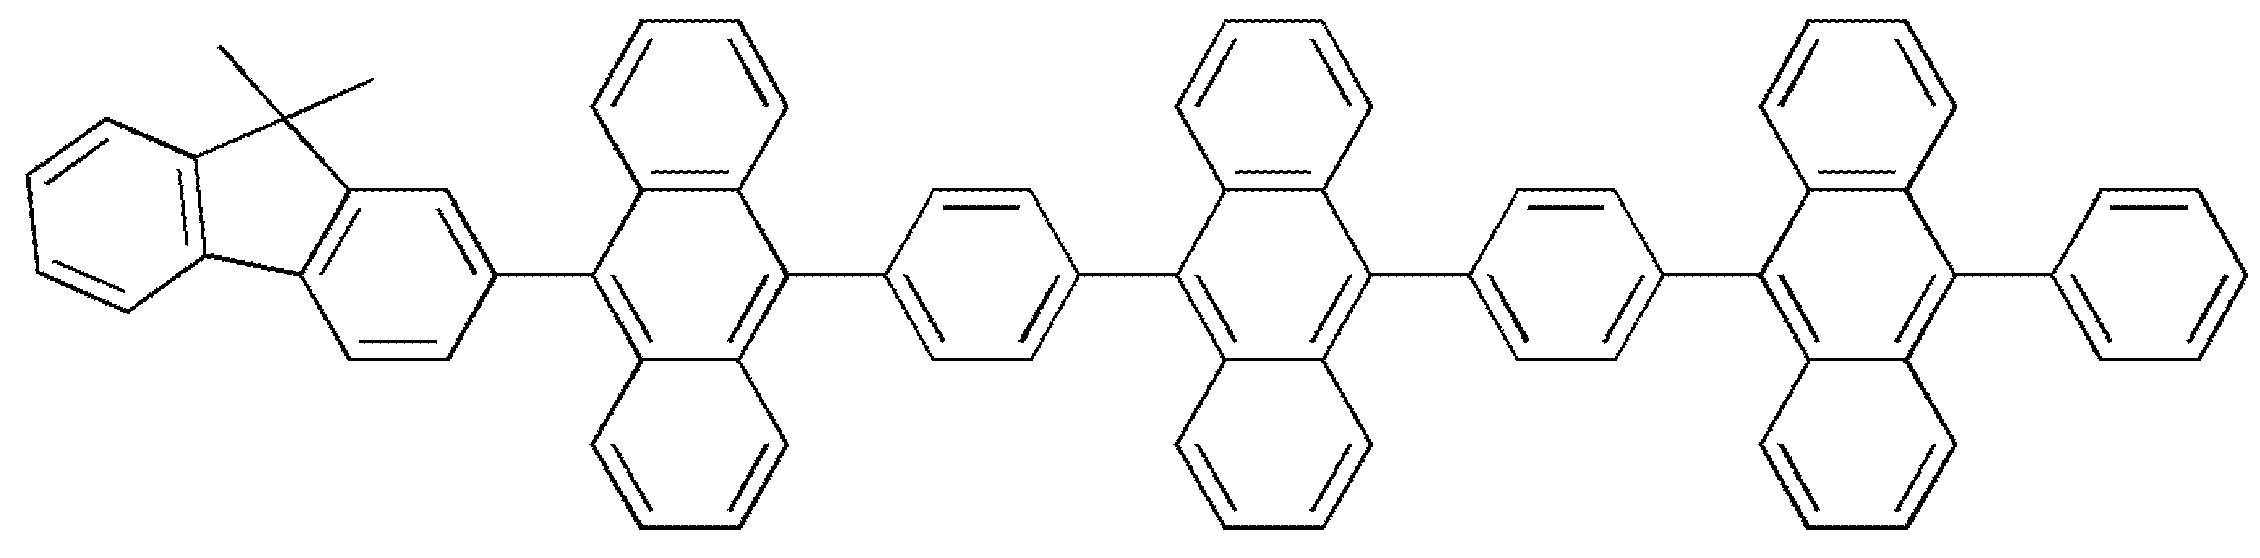 Figure 112007087103673-pat00659